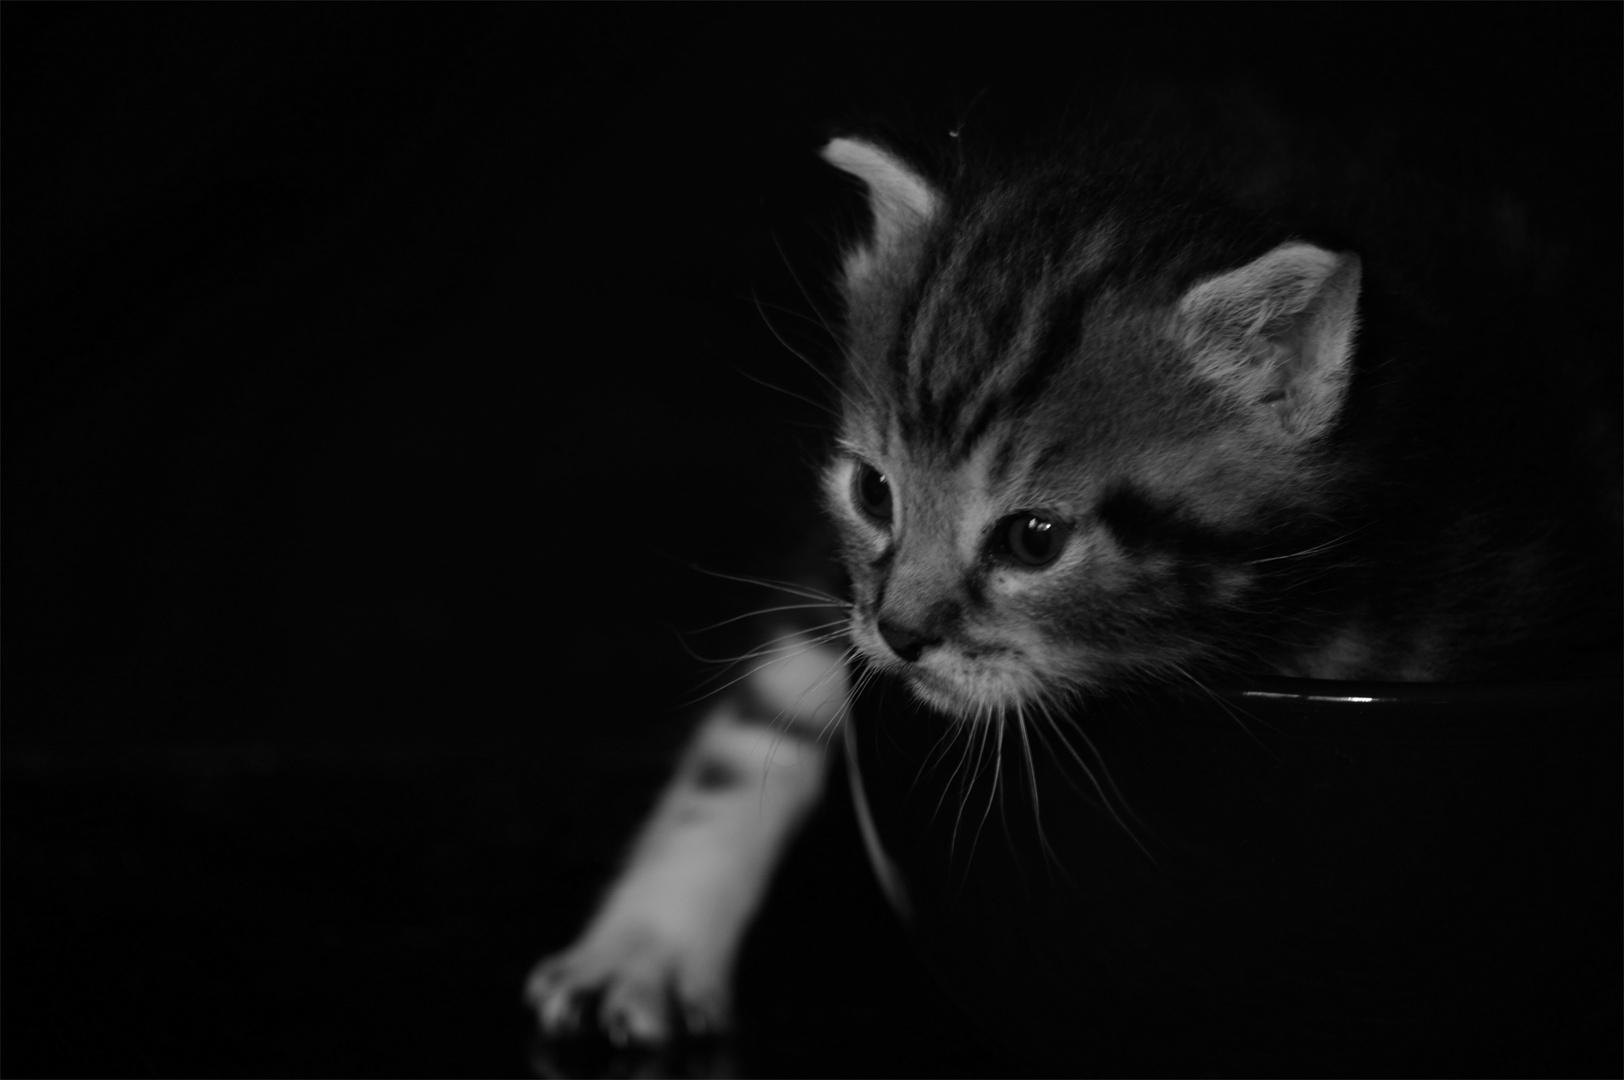 Baby Katze 4